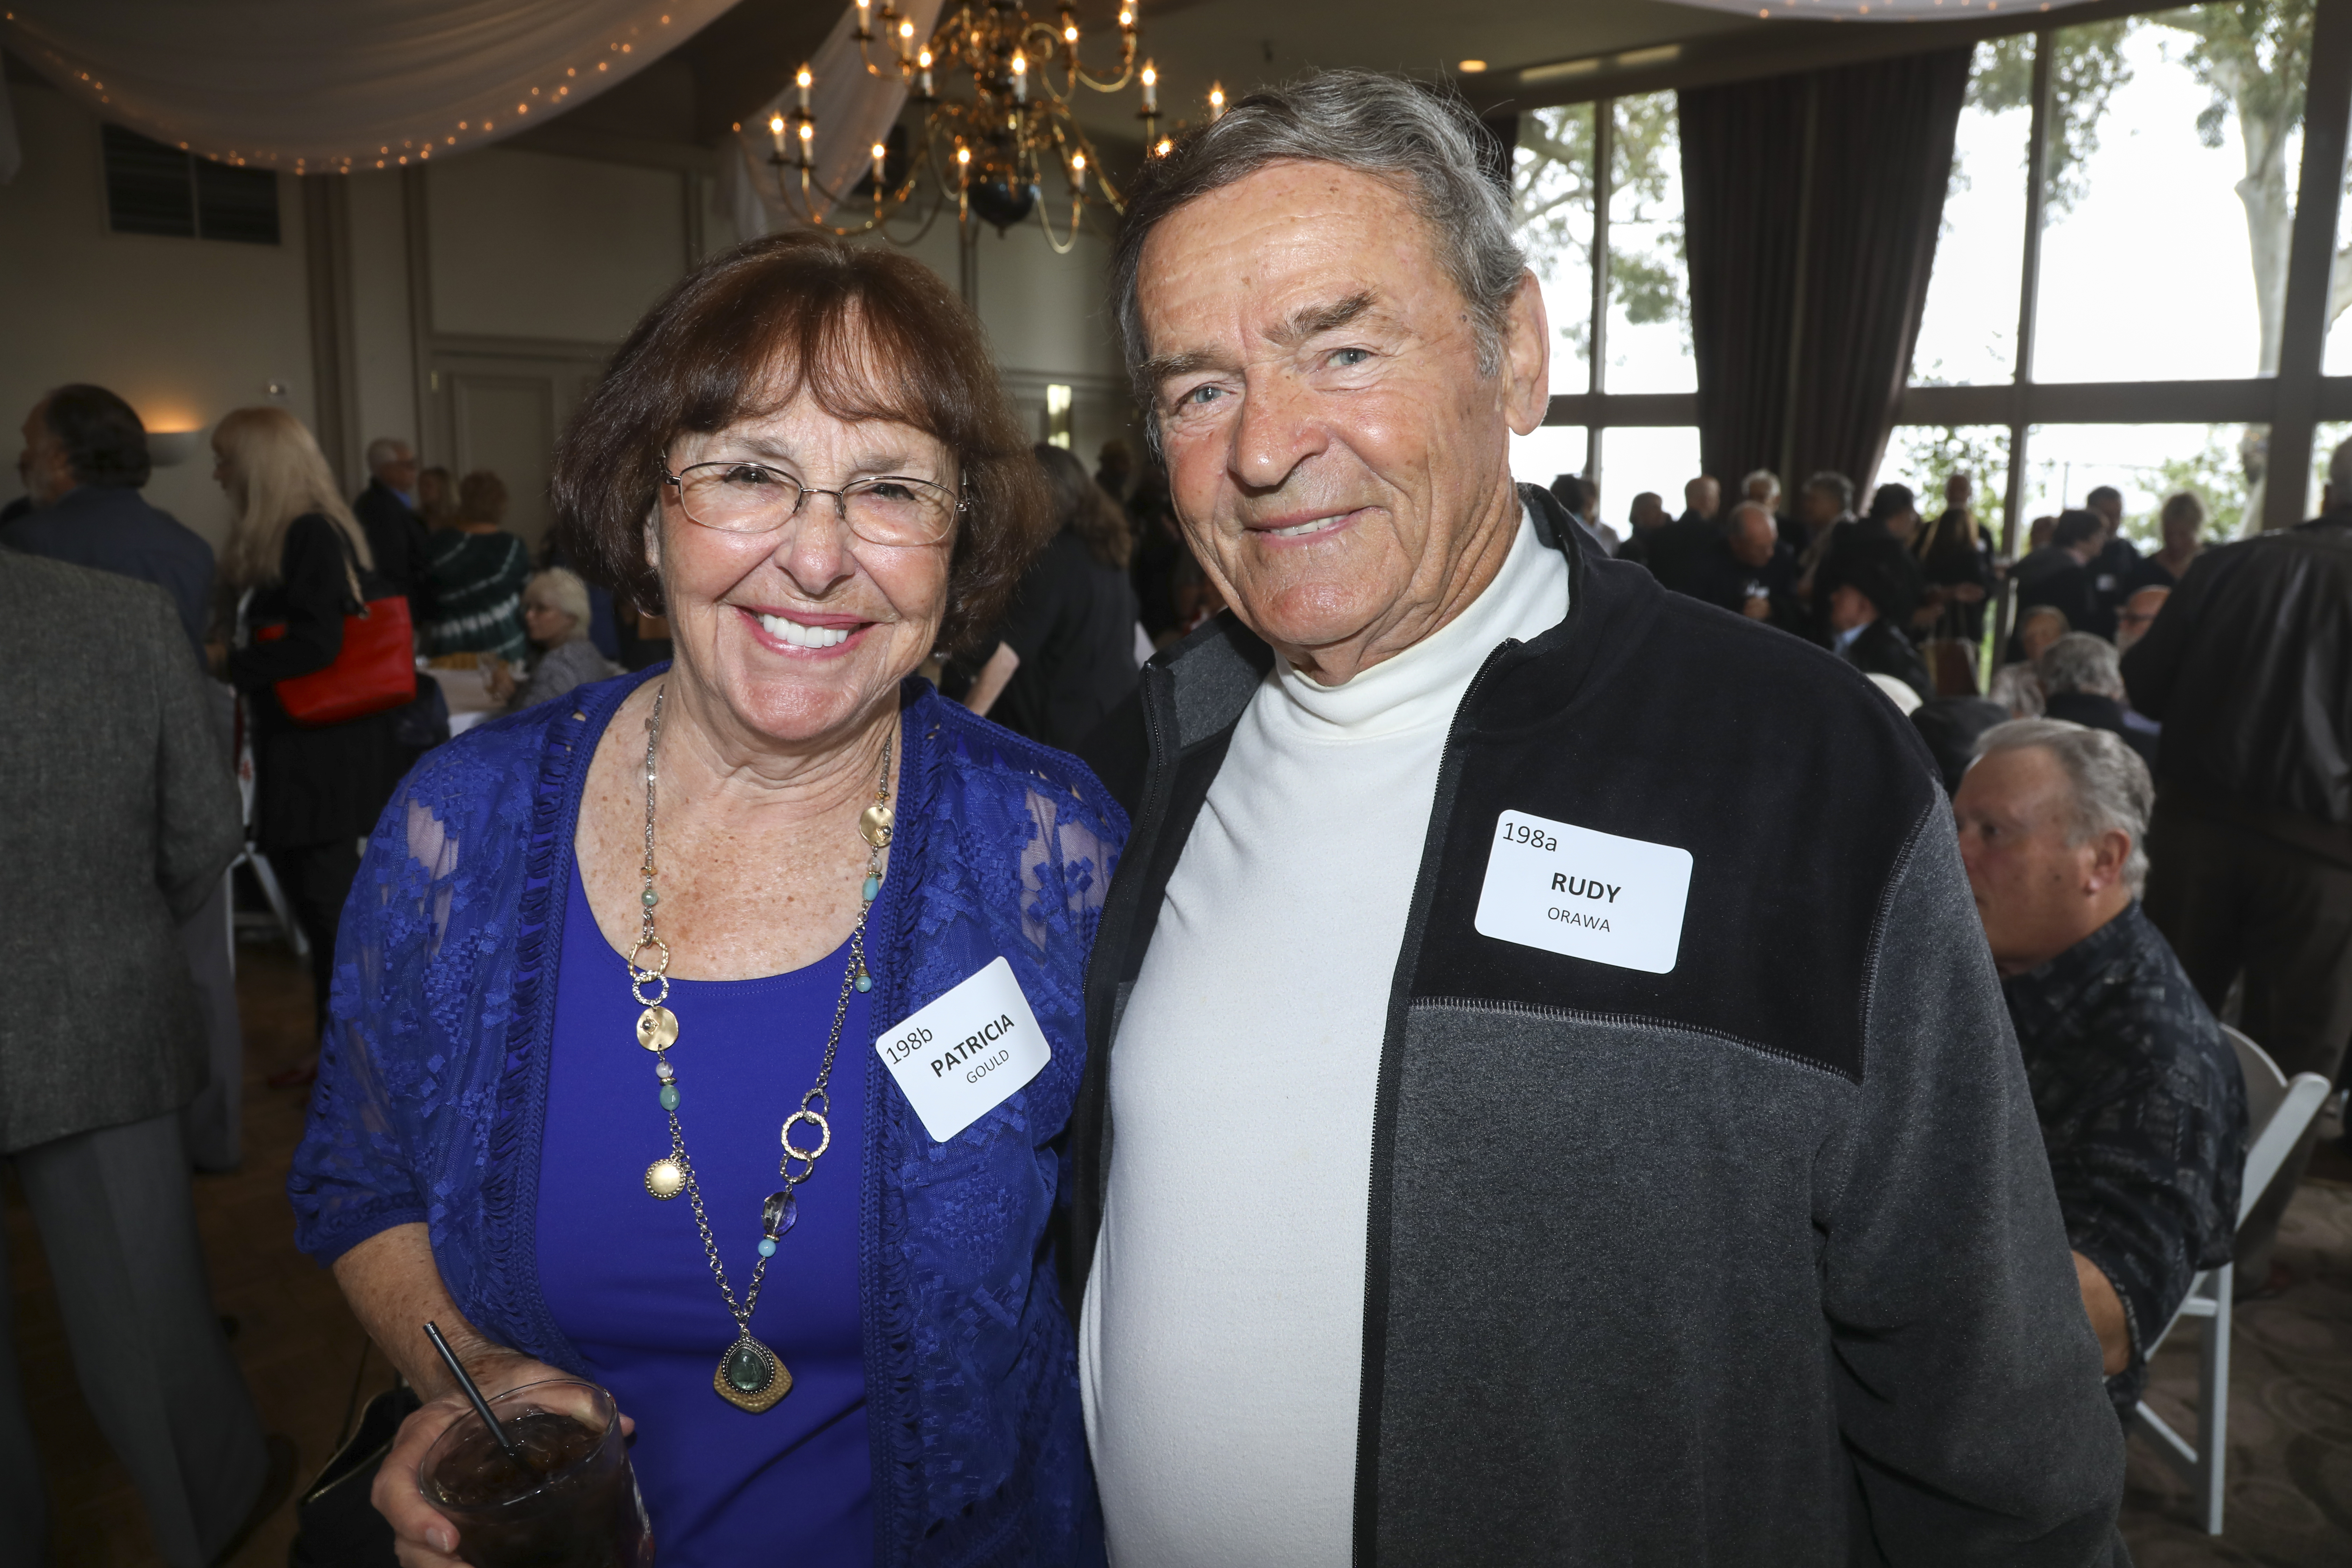 Patricia Gould, Rudy Orawa